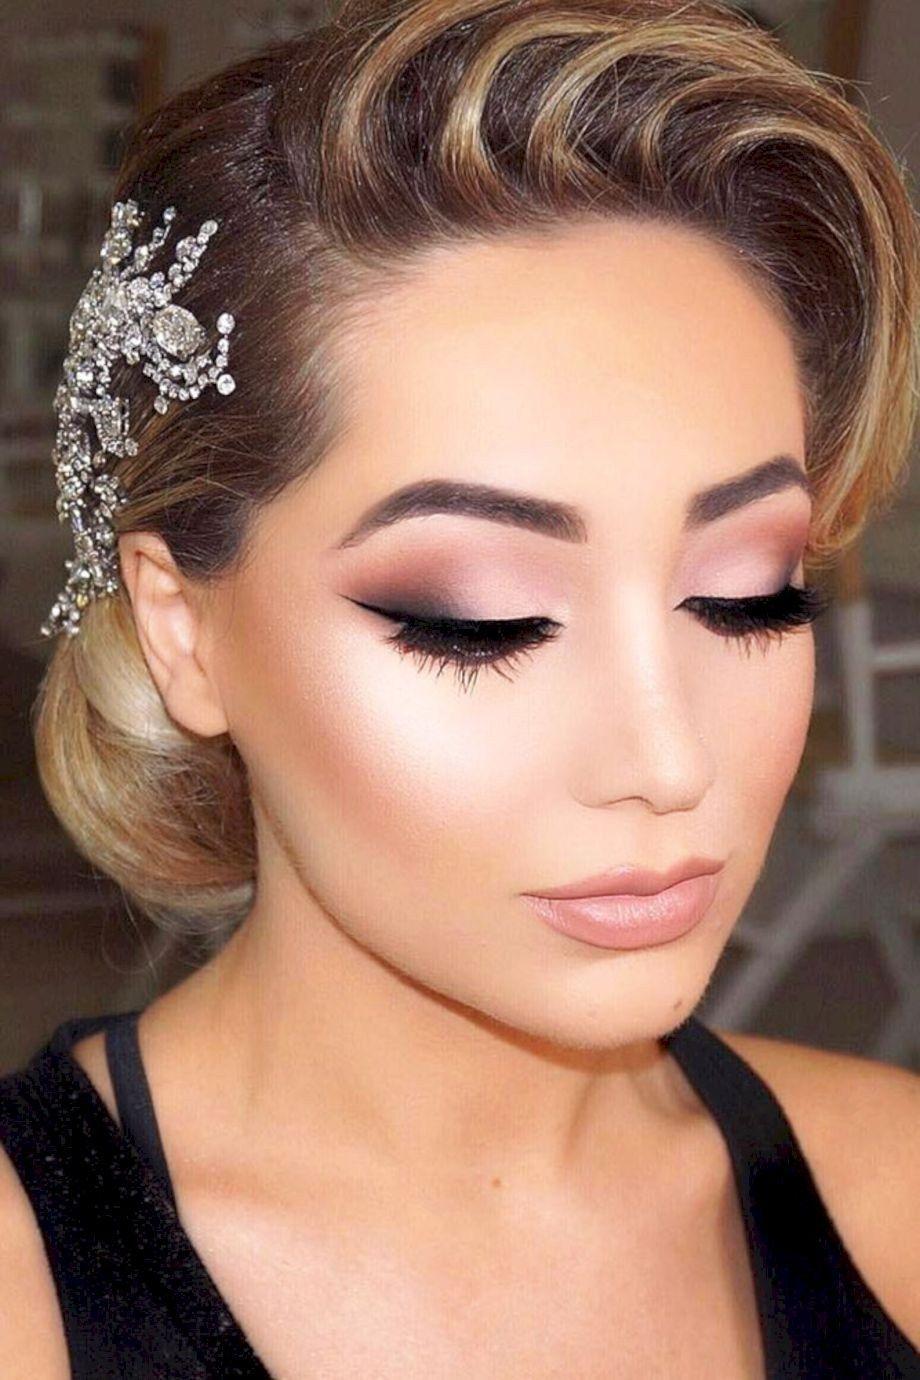 Wedding Makeup Follow Tiandrasblog On Pinterest And